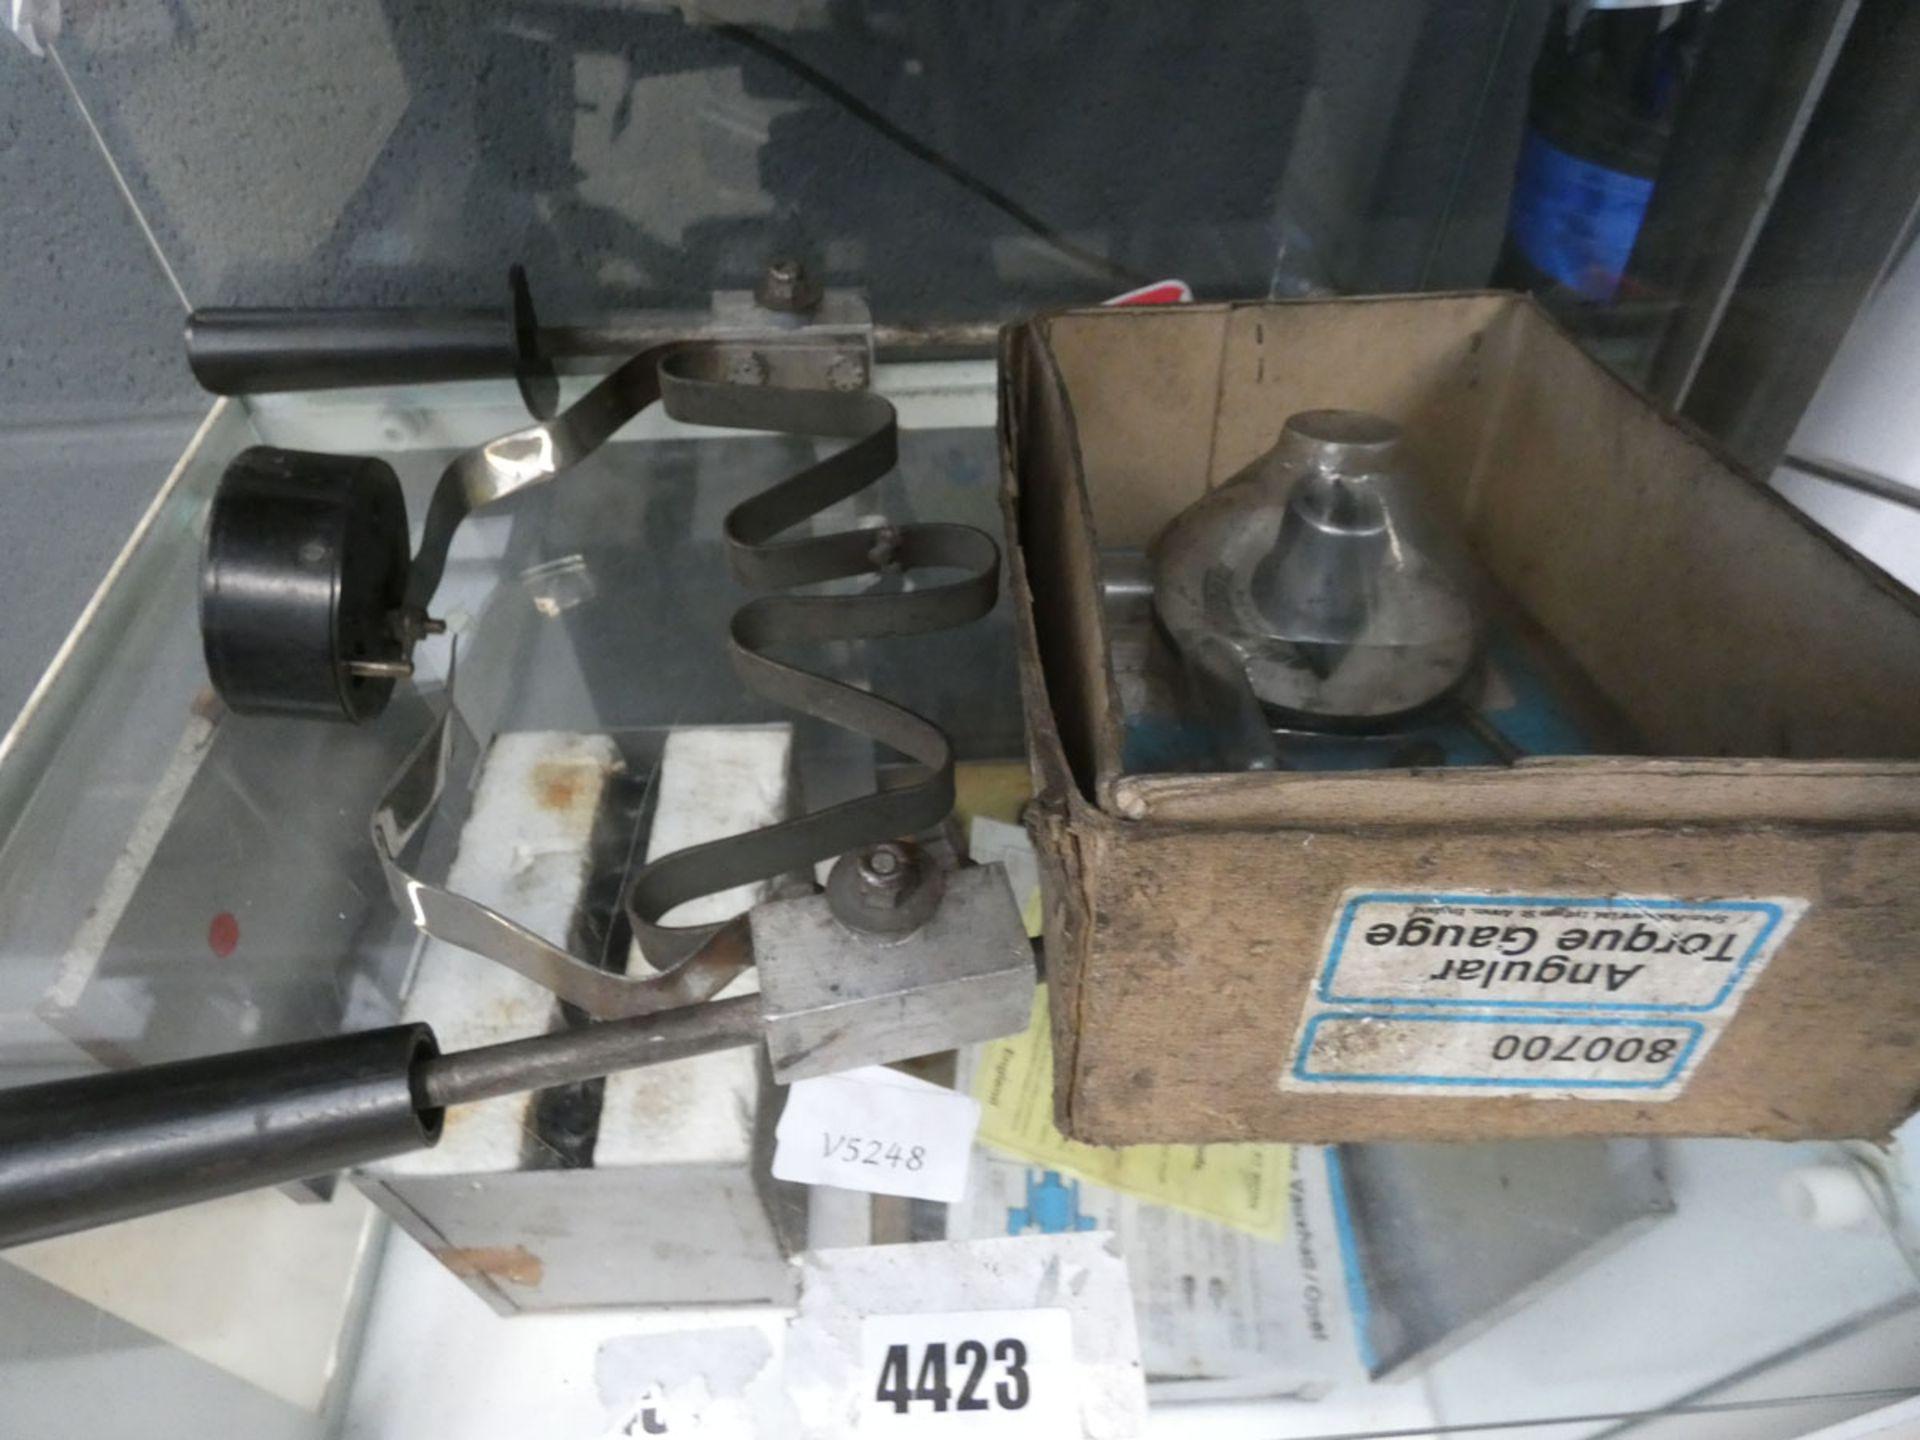 Sykes-Pickavant angular torque gauge and a battery tester